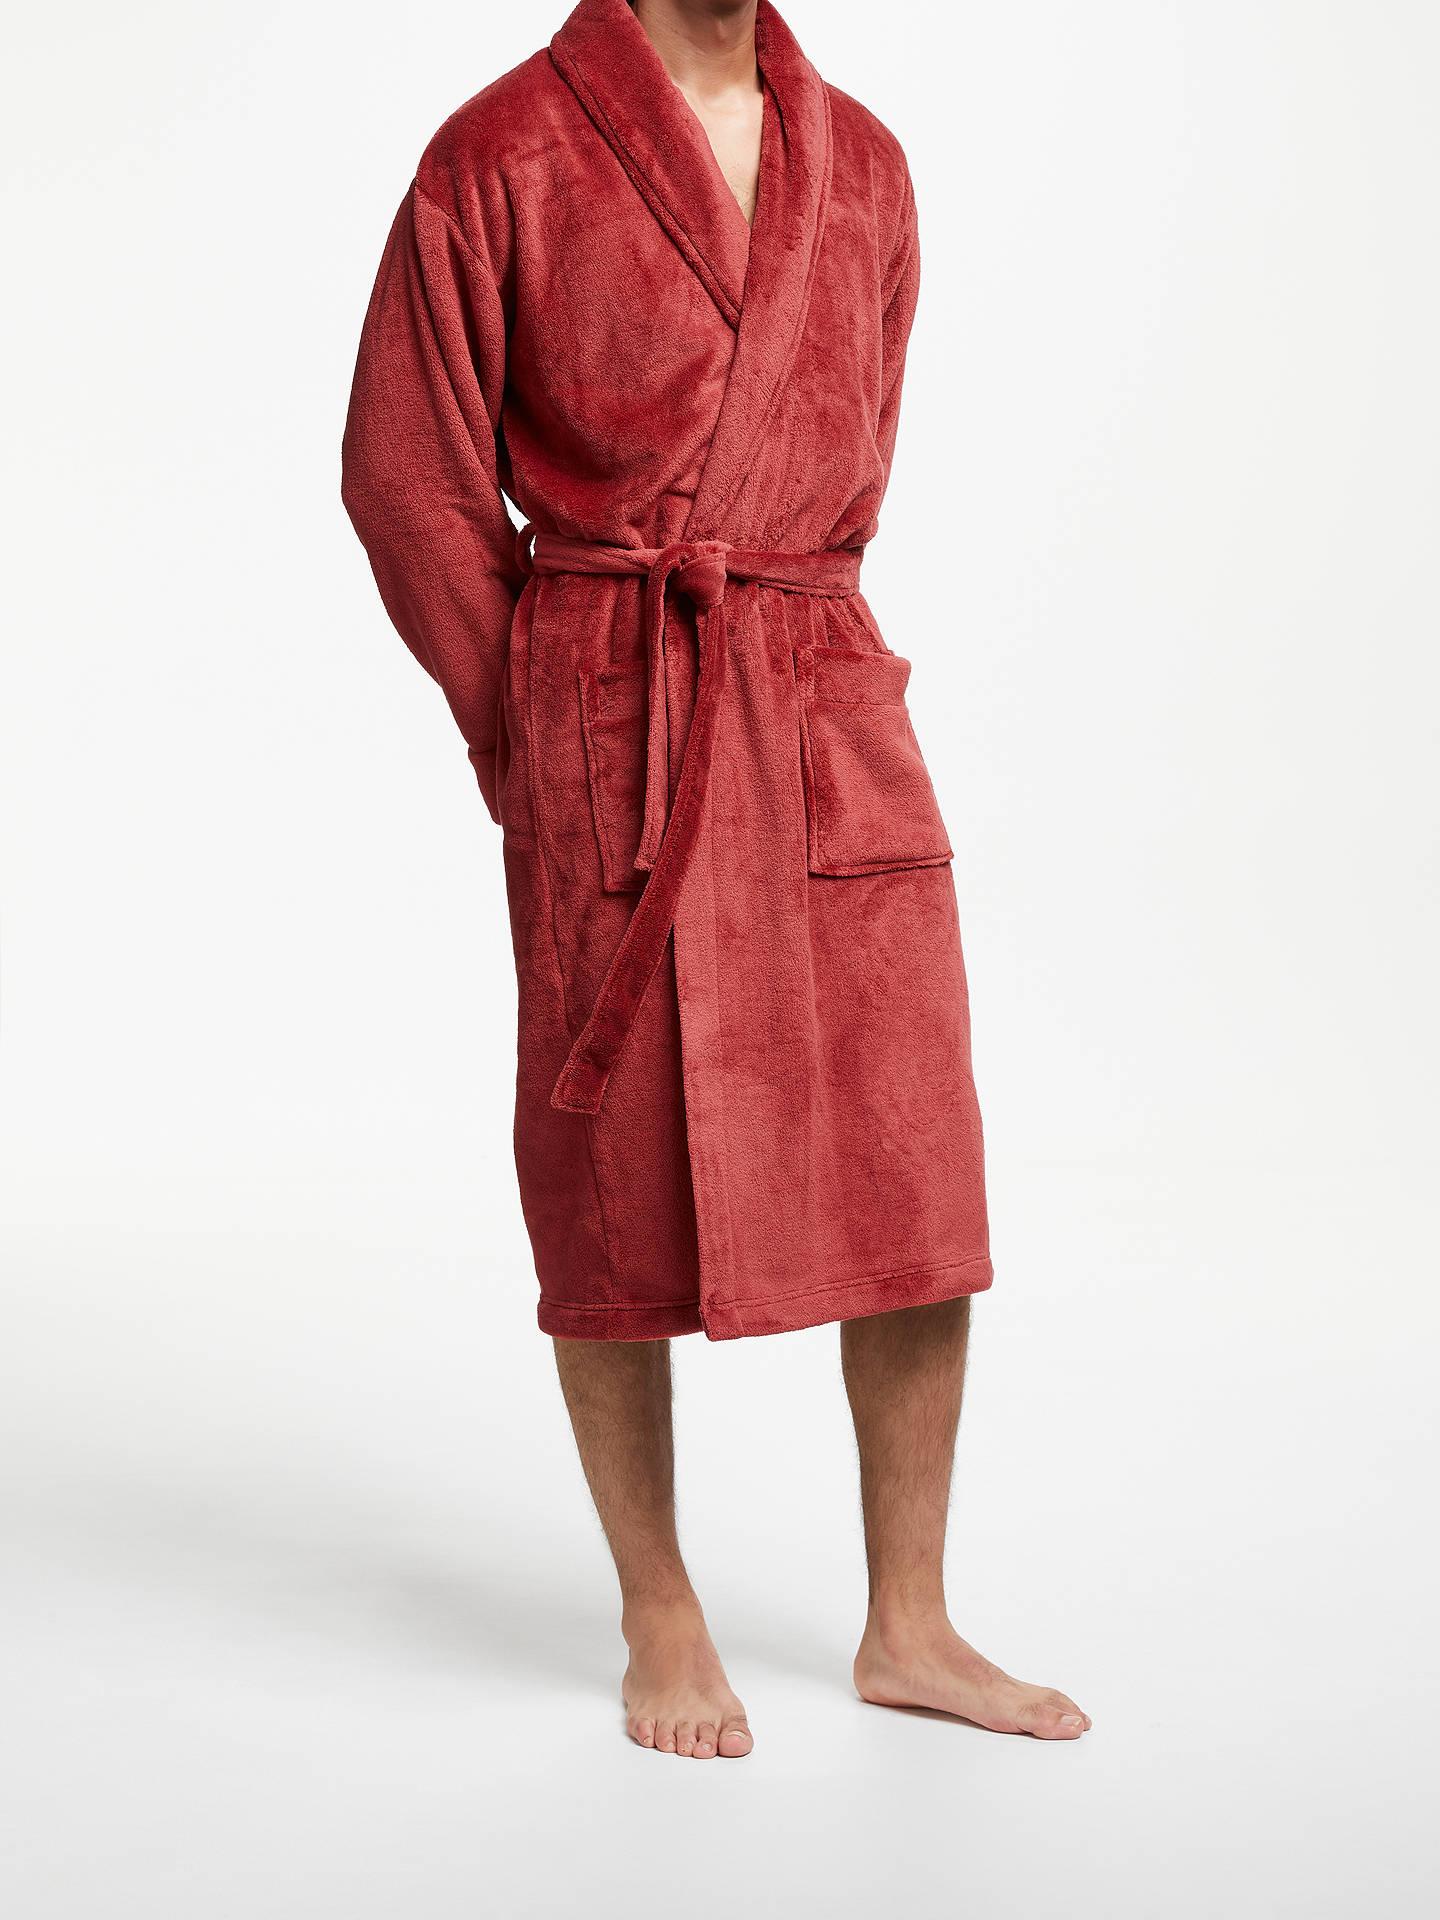 John Lewis Fleece Dressing Gown Red At John Lewis Partners